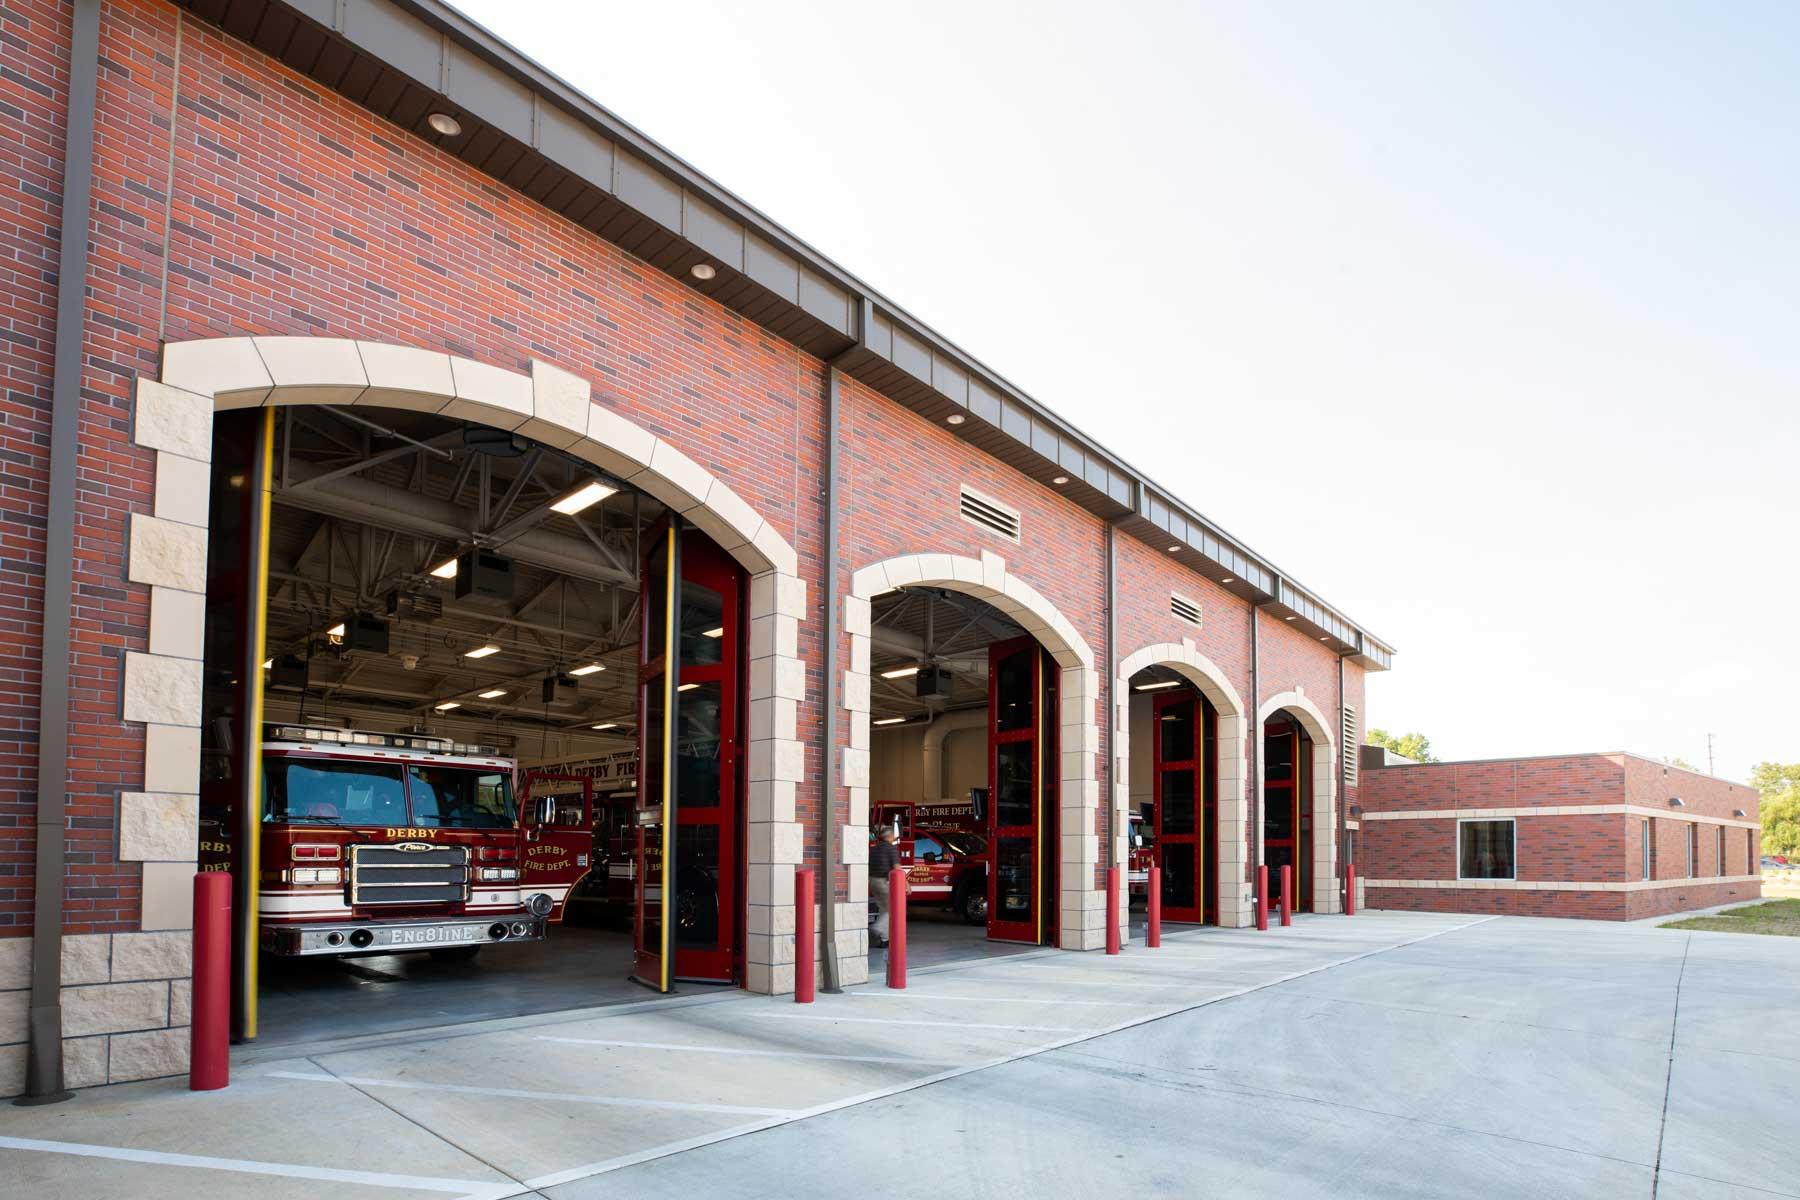 Derby Fire Station Exterior Doors